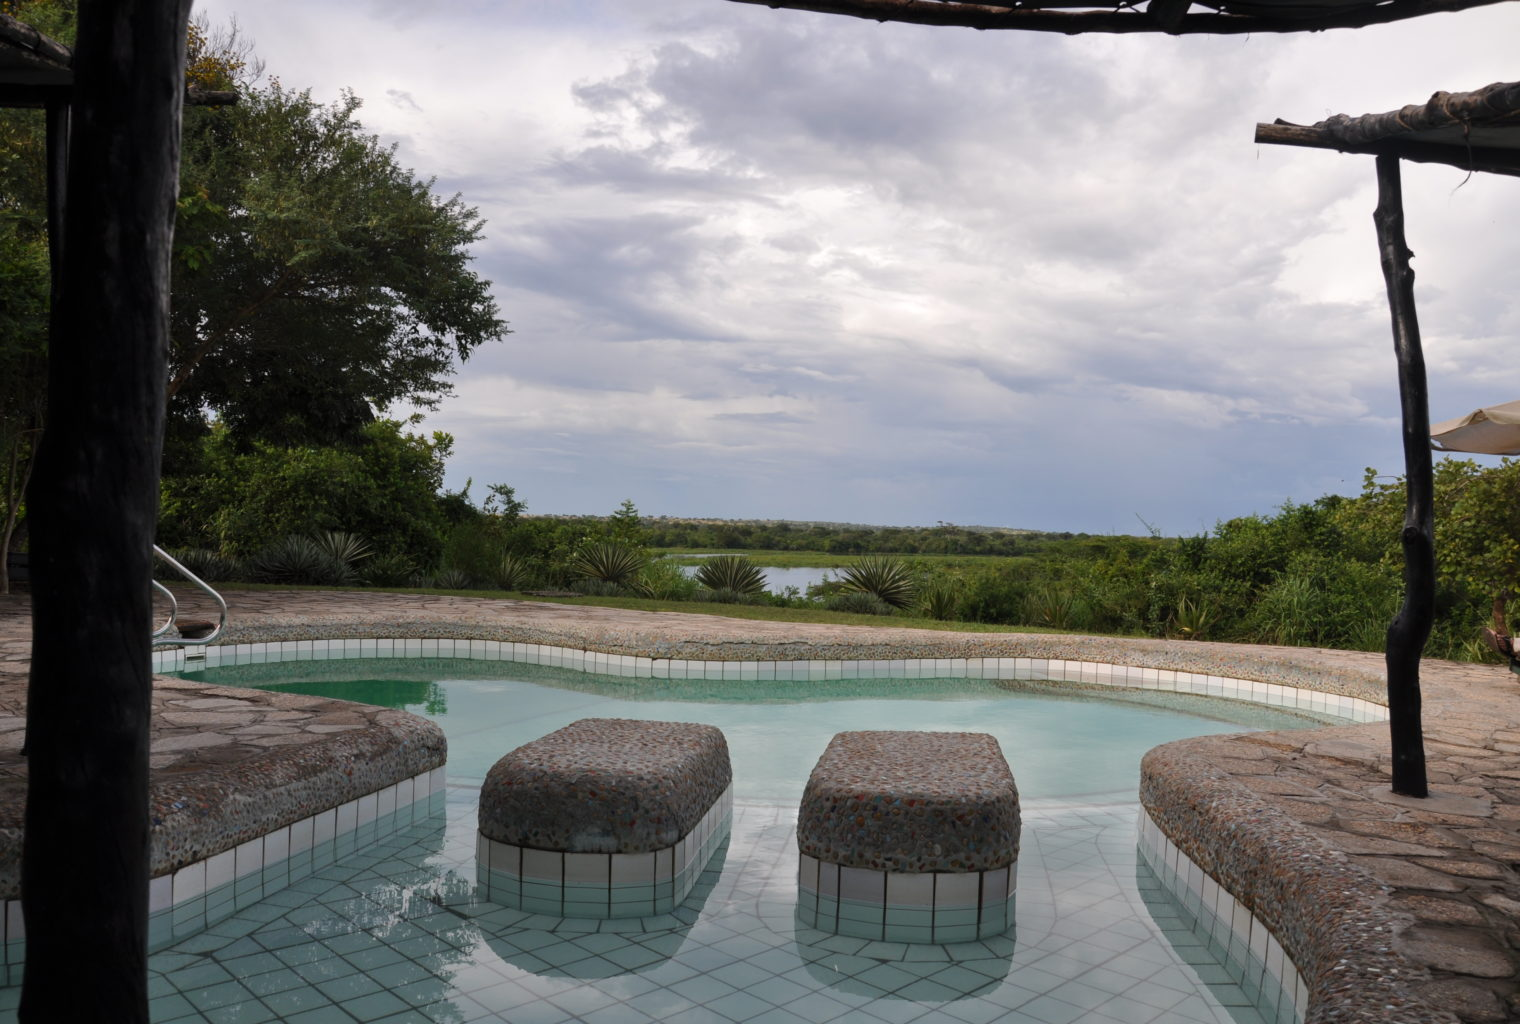 Nile geo safari lodge journeys by design for Pool design manufaktur ug rottenburg